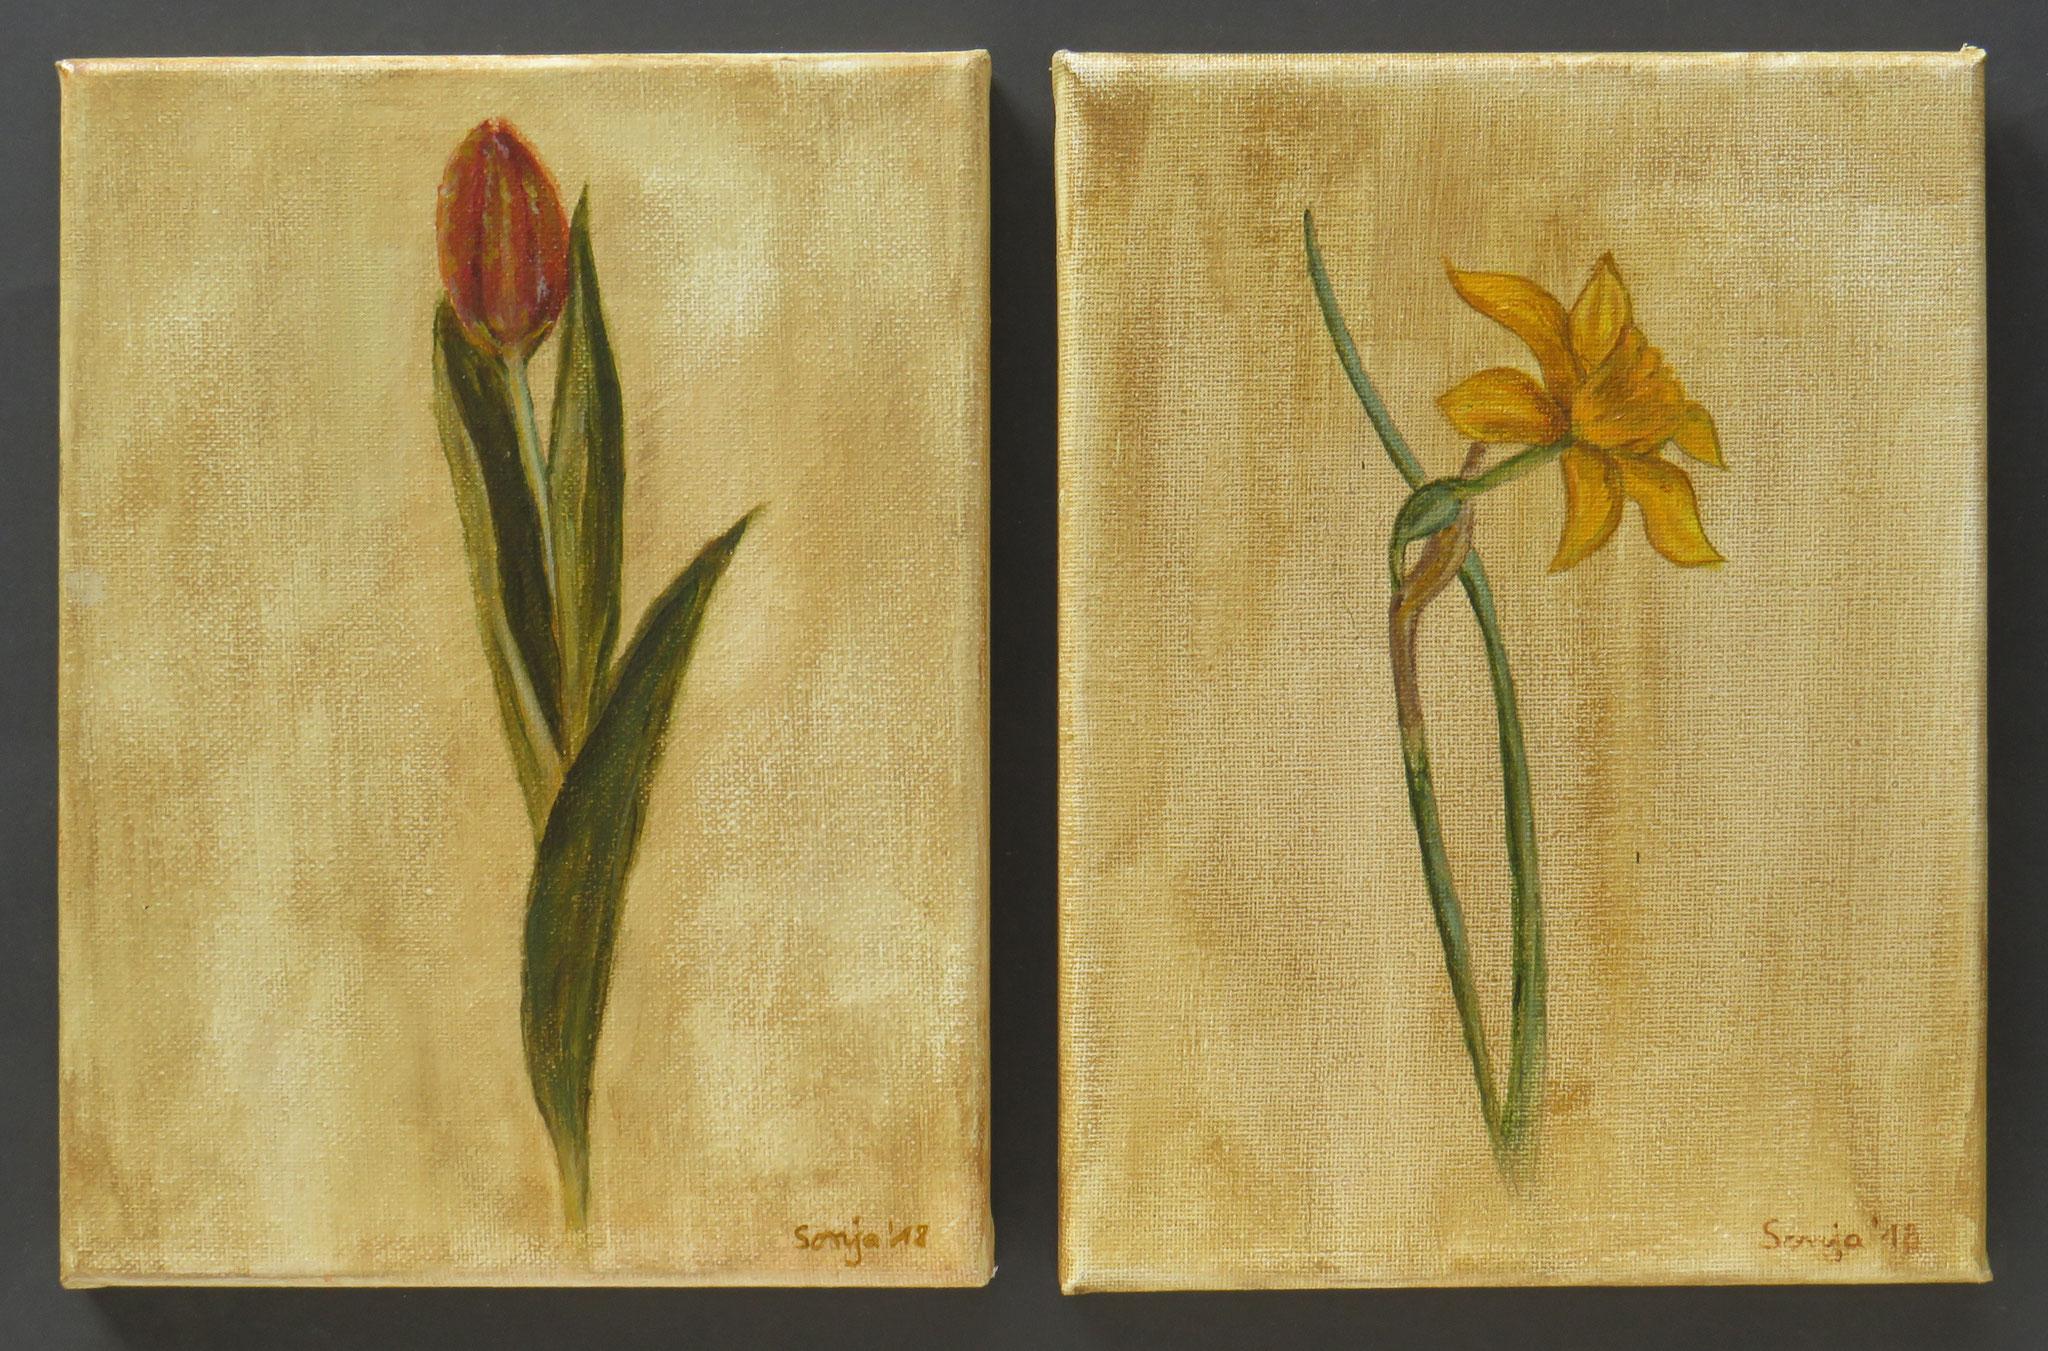 """Tulpe und Narzisse"", Acryl auf Leinwand, jeweils 18 x 24 cm"